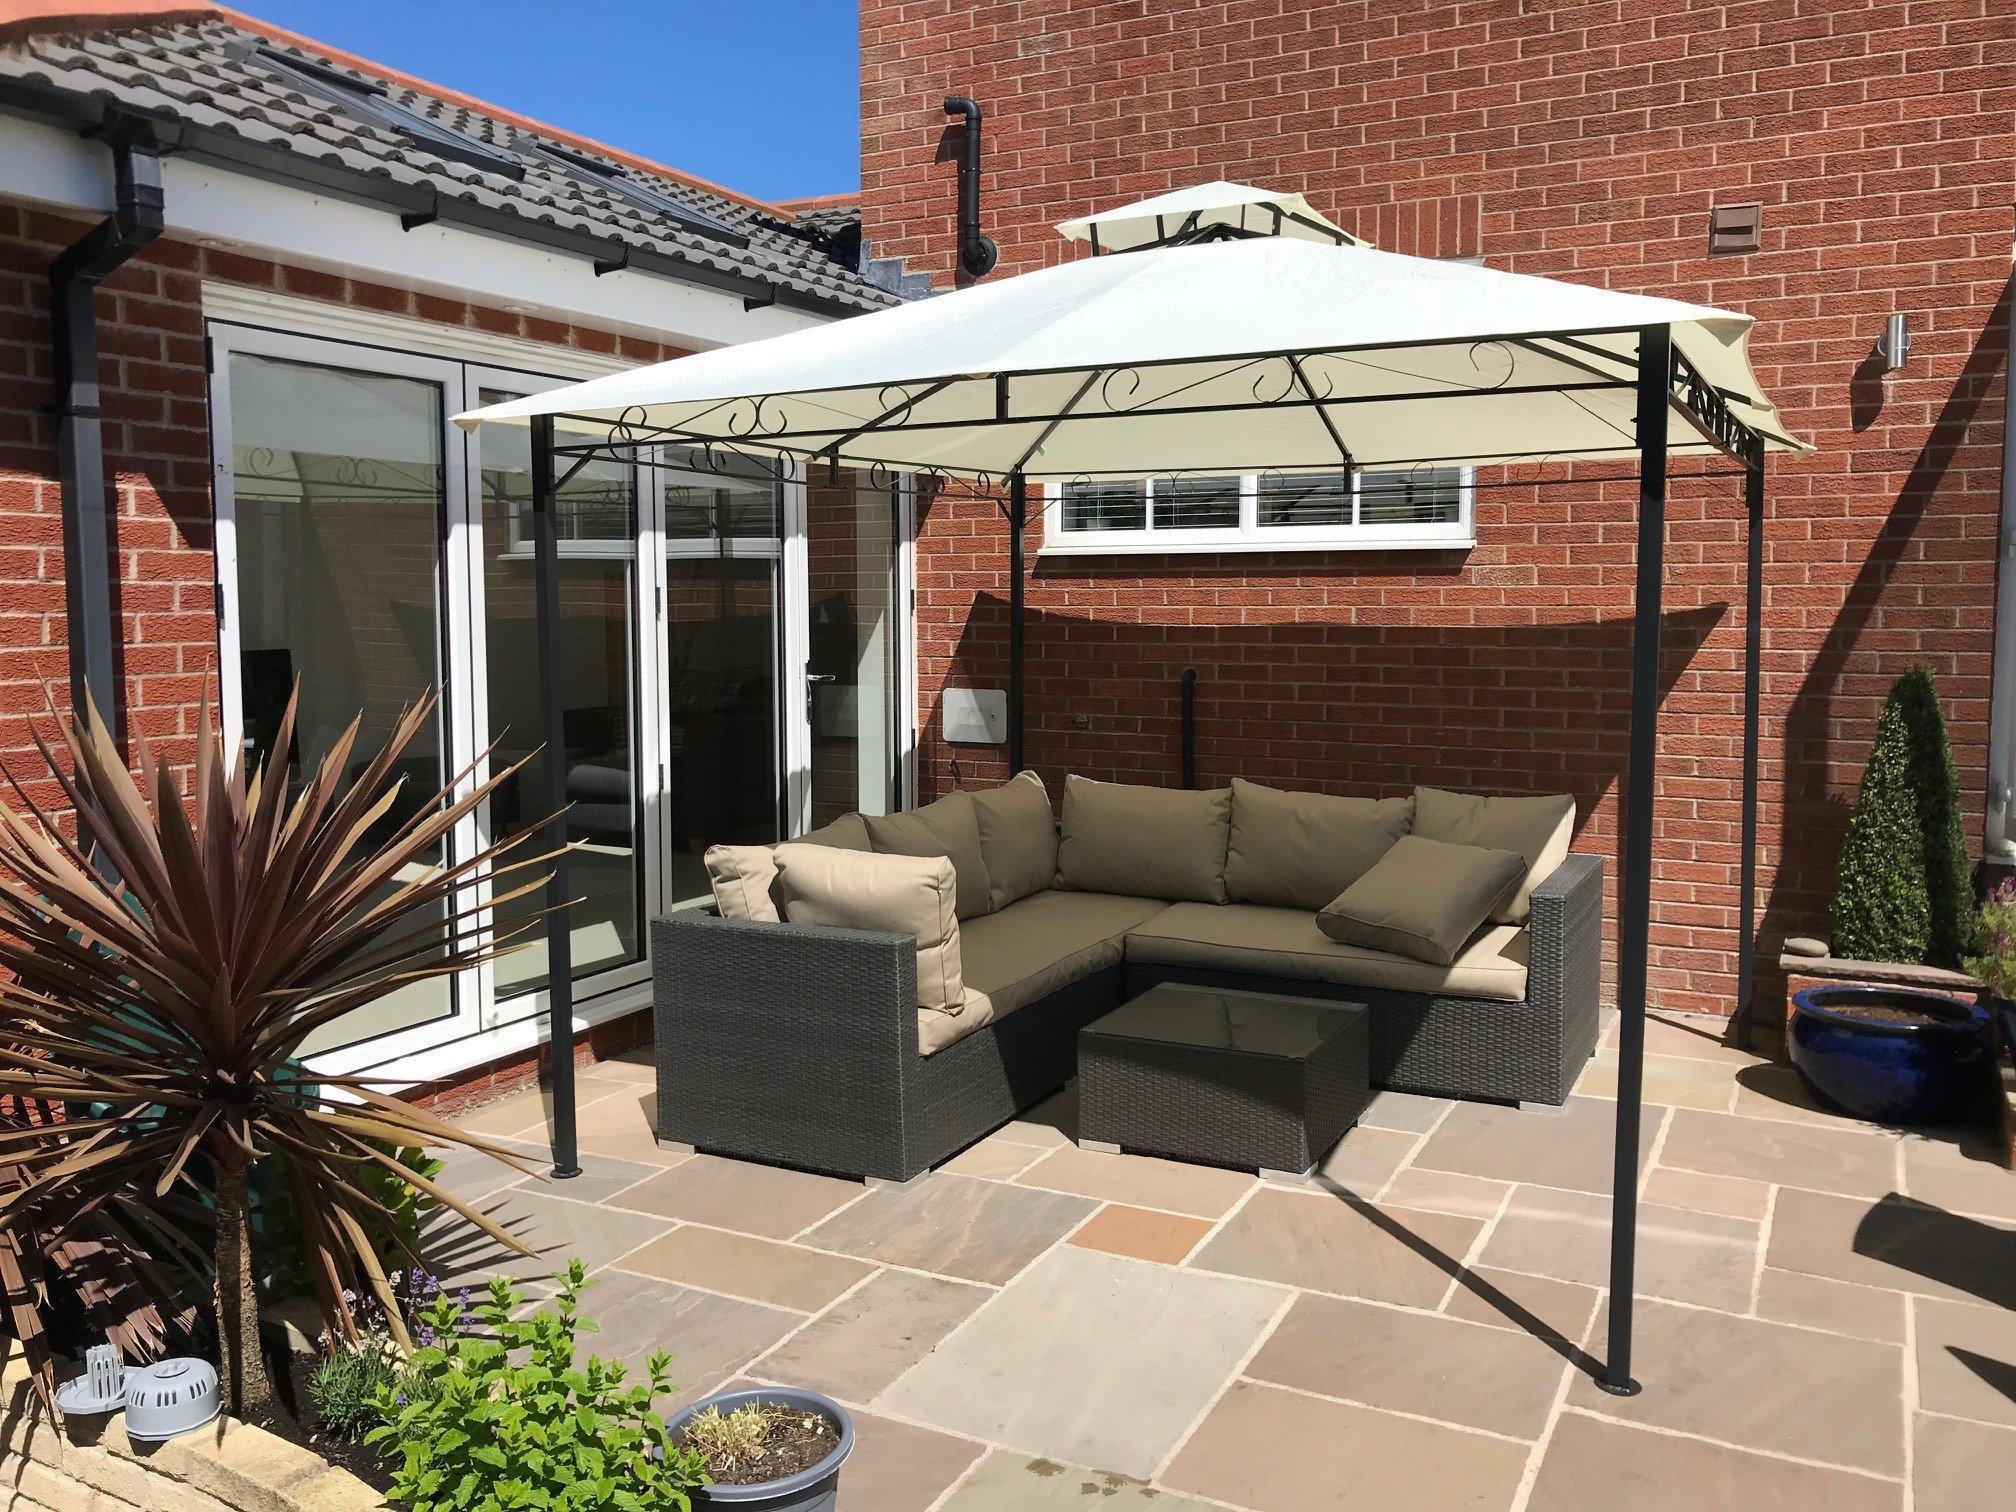 Garden Gazebo Ecru Party Shelter Patio Shade Outdoor Sun Canopy Stunning Design  sc 1 st  Amazon UK & Patio Canopy: Amazon.co.uk